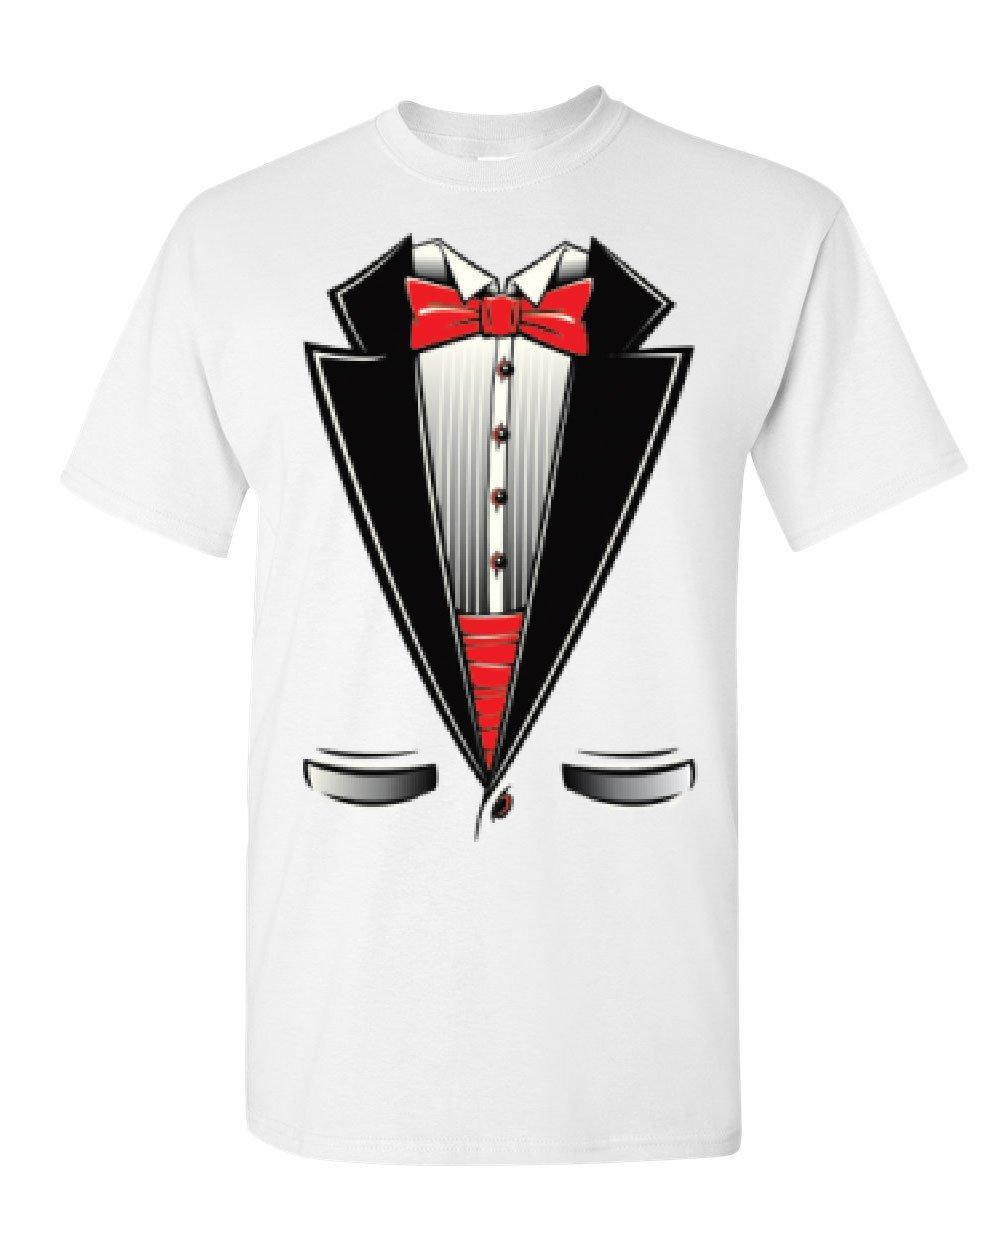 Funny Tuxedo Bow Tie T-Shirt Tux Wedding Party Tee Shirt White L